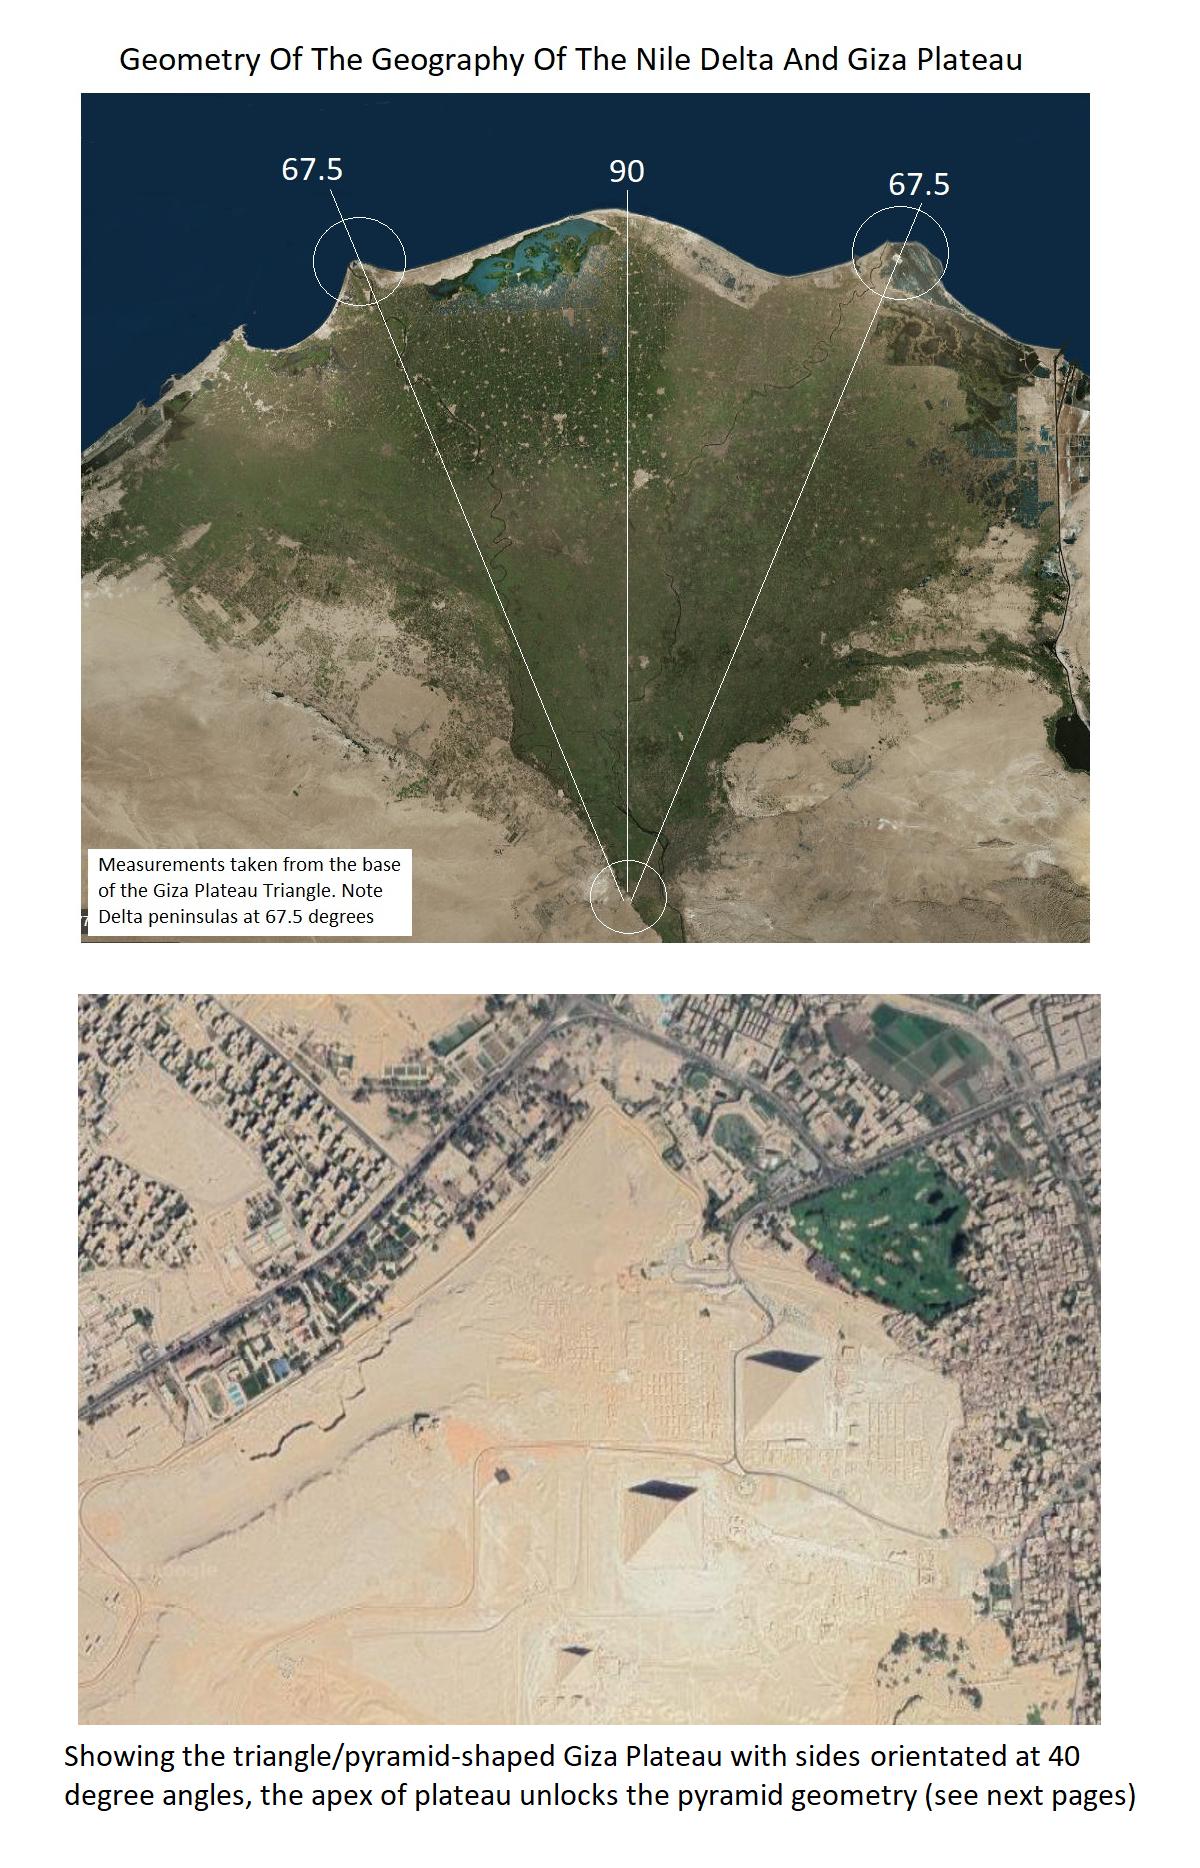 Giza and Nile Delta Geometry 1